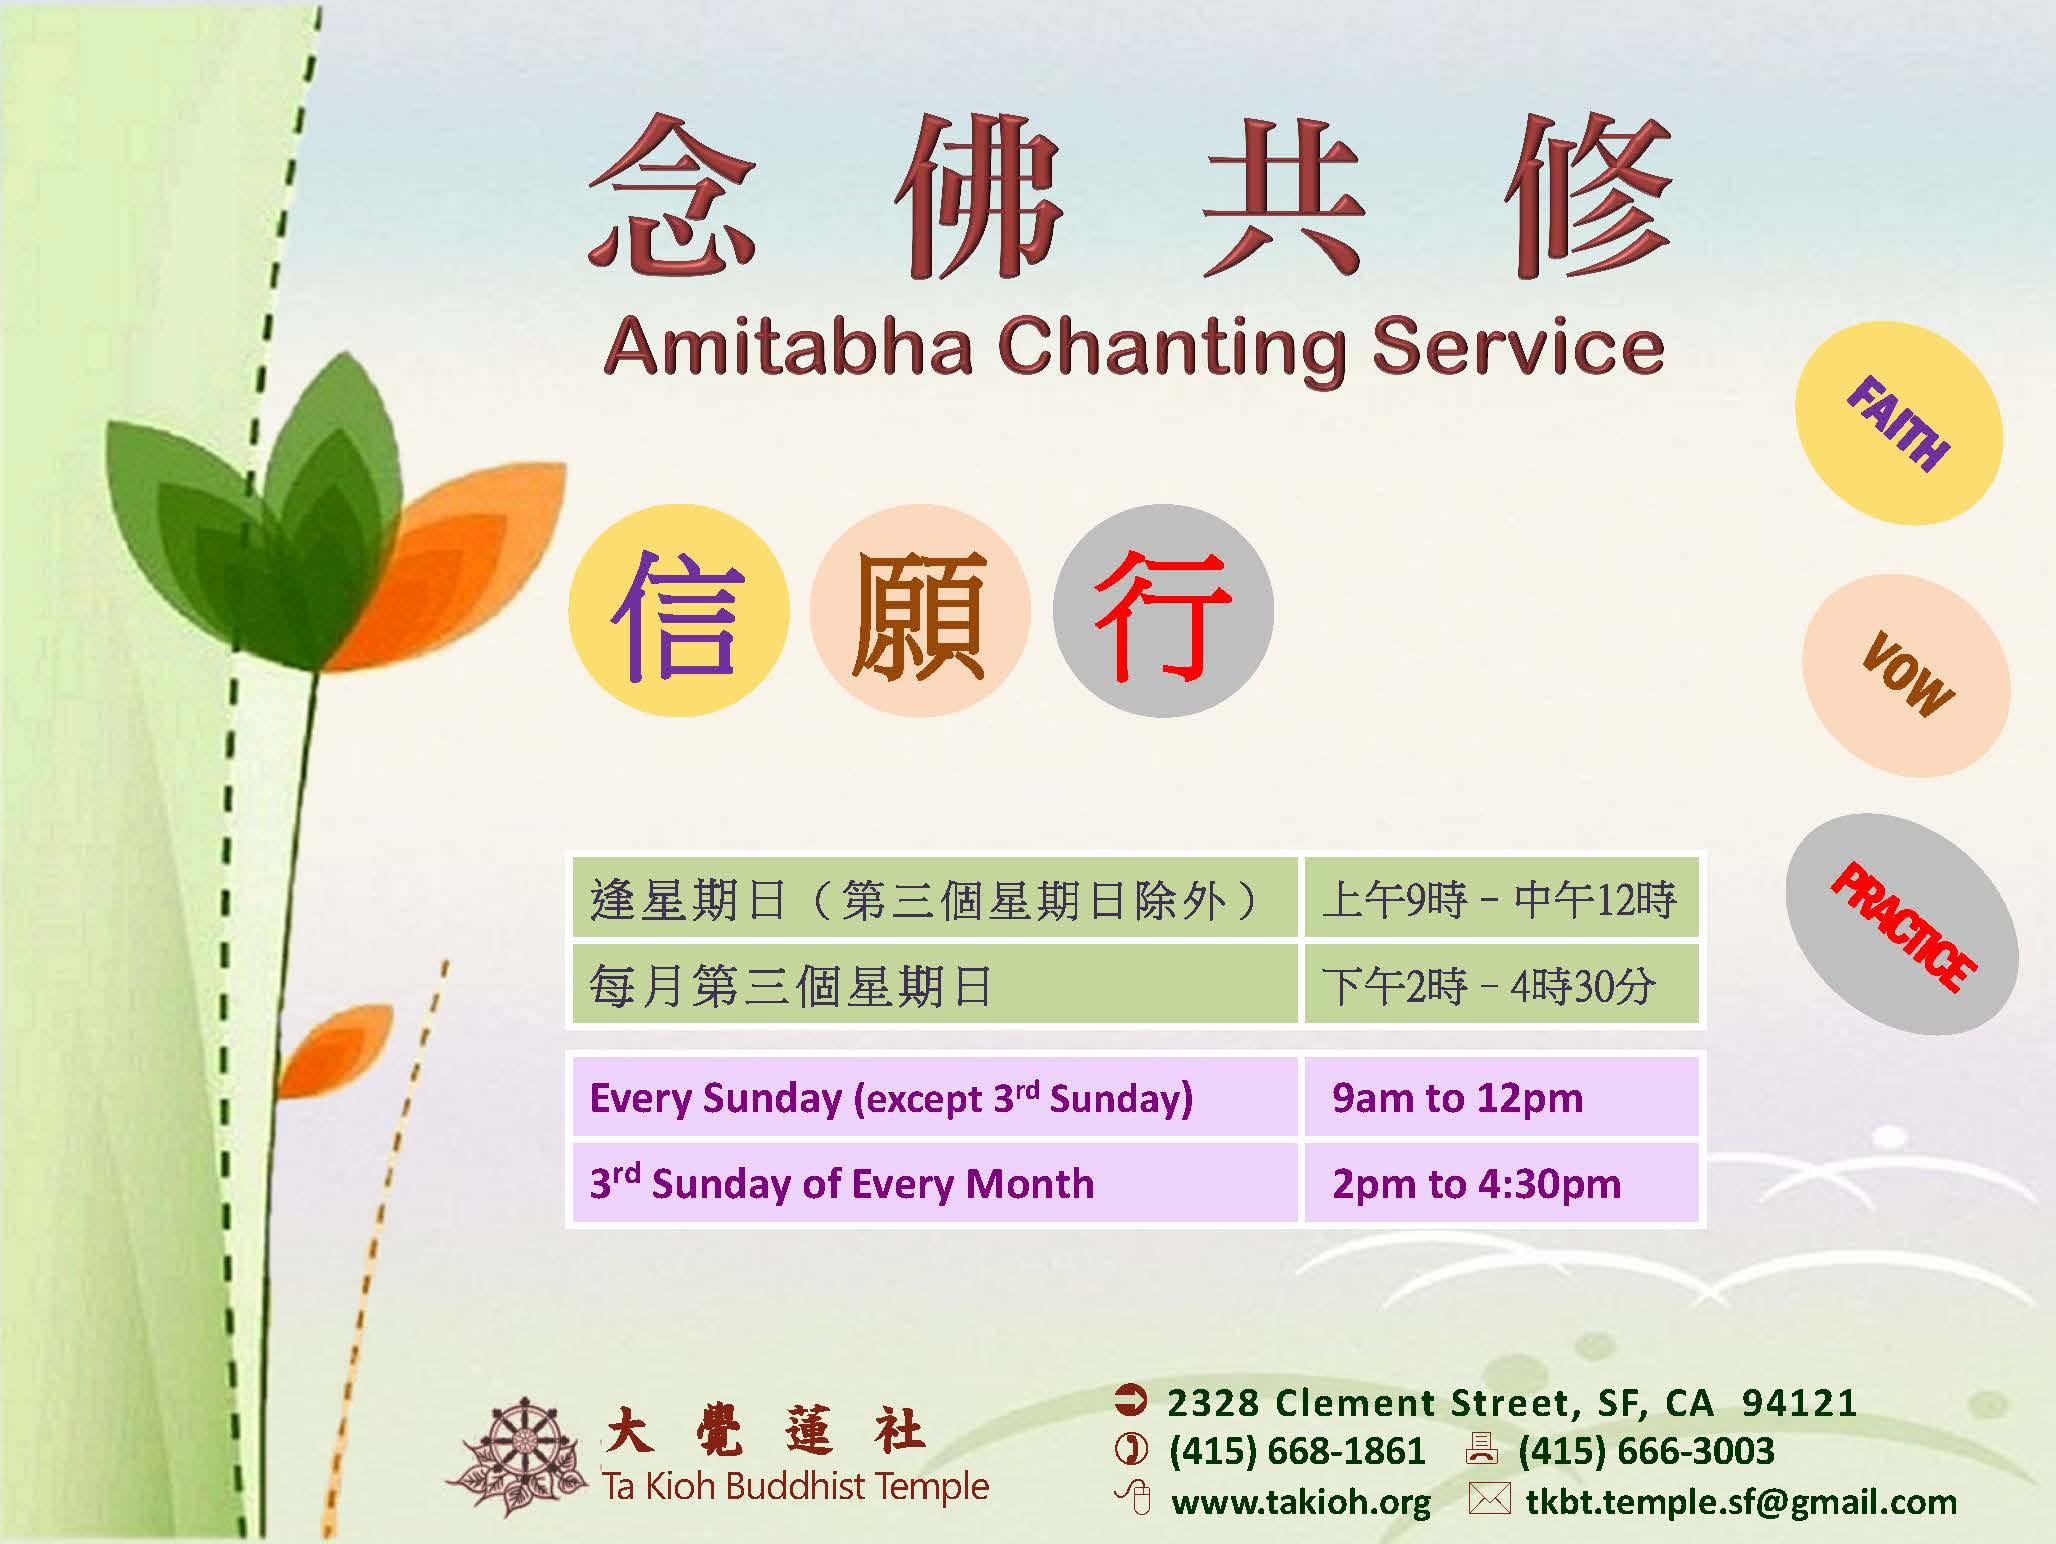 Amitabha Chanting Service Schedule